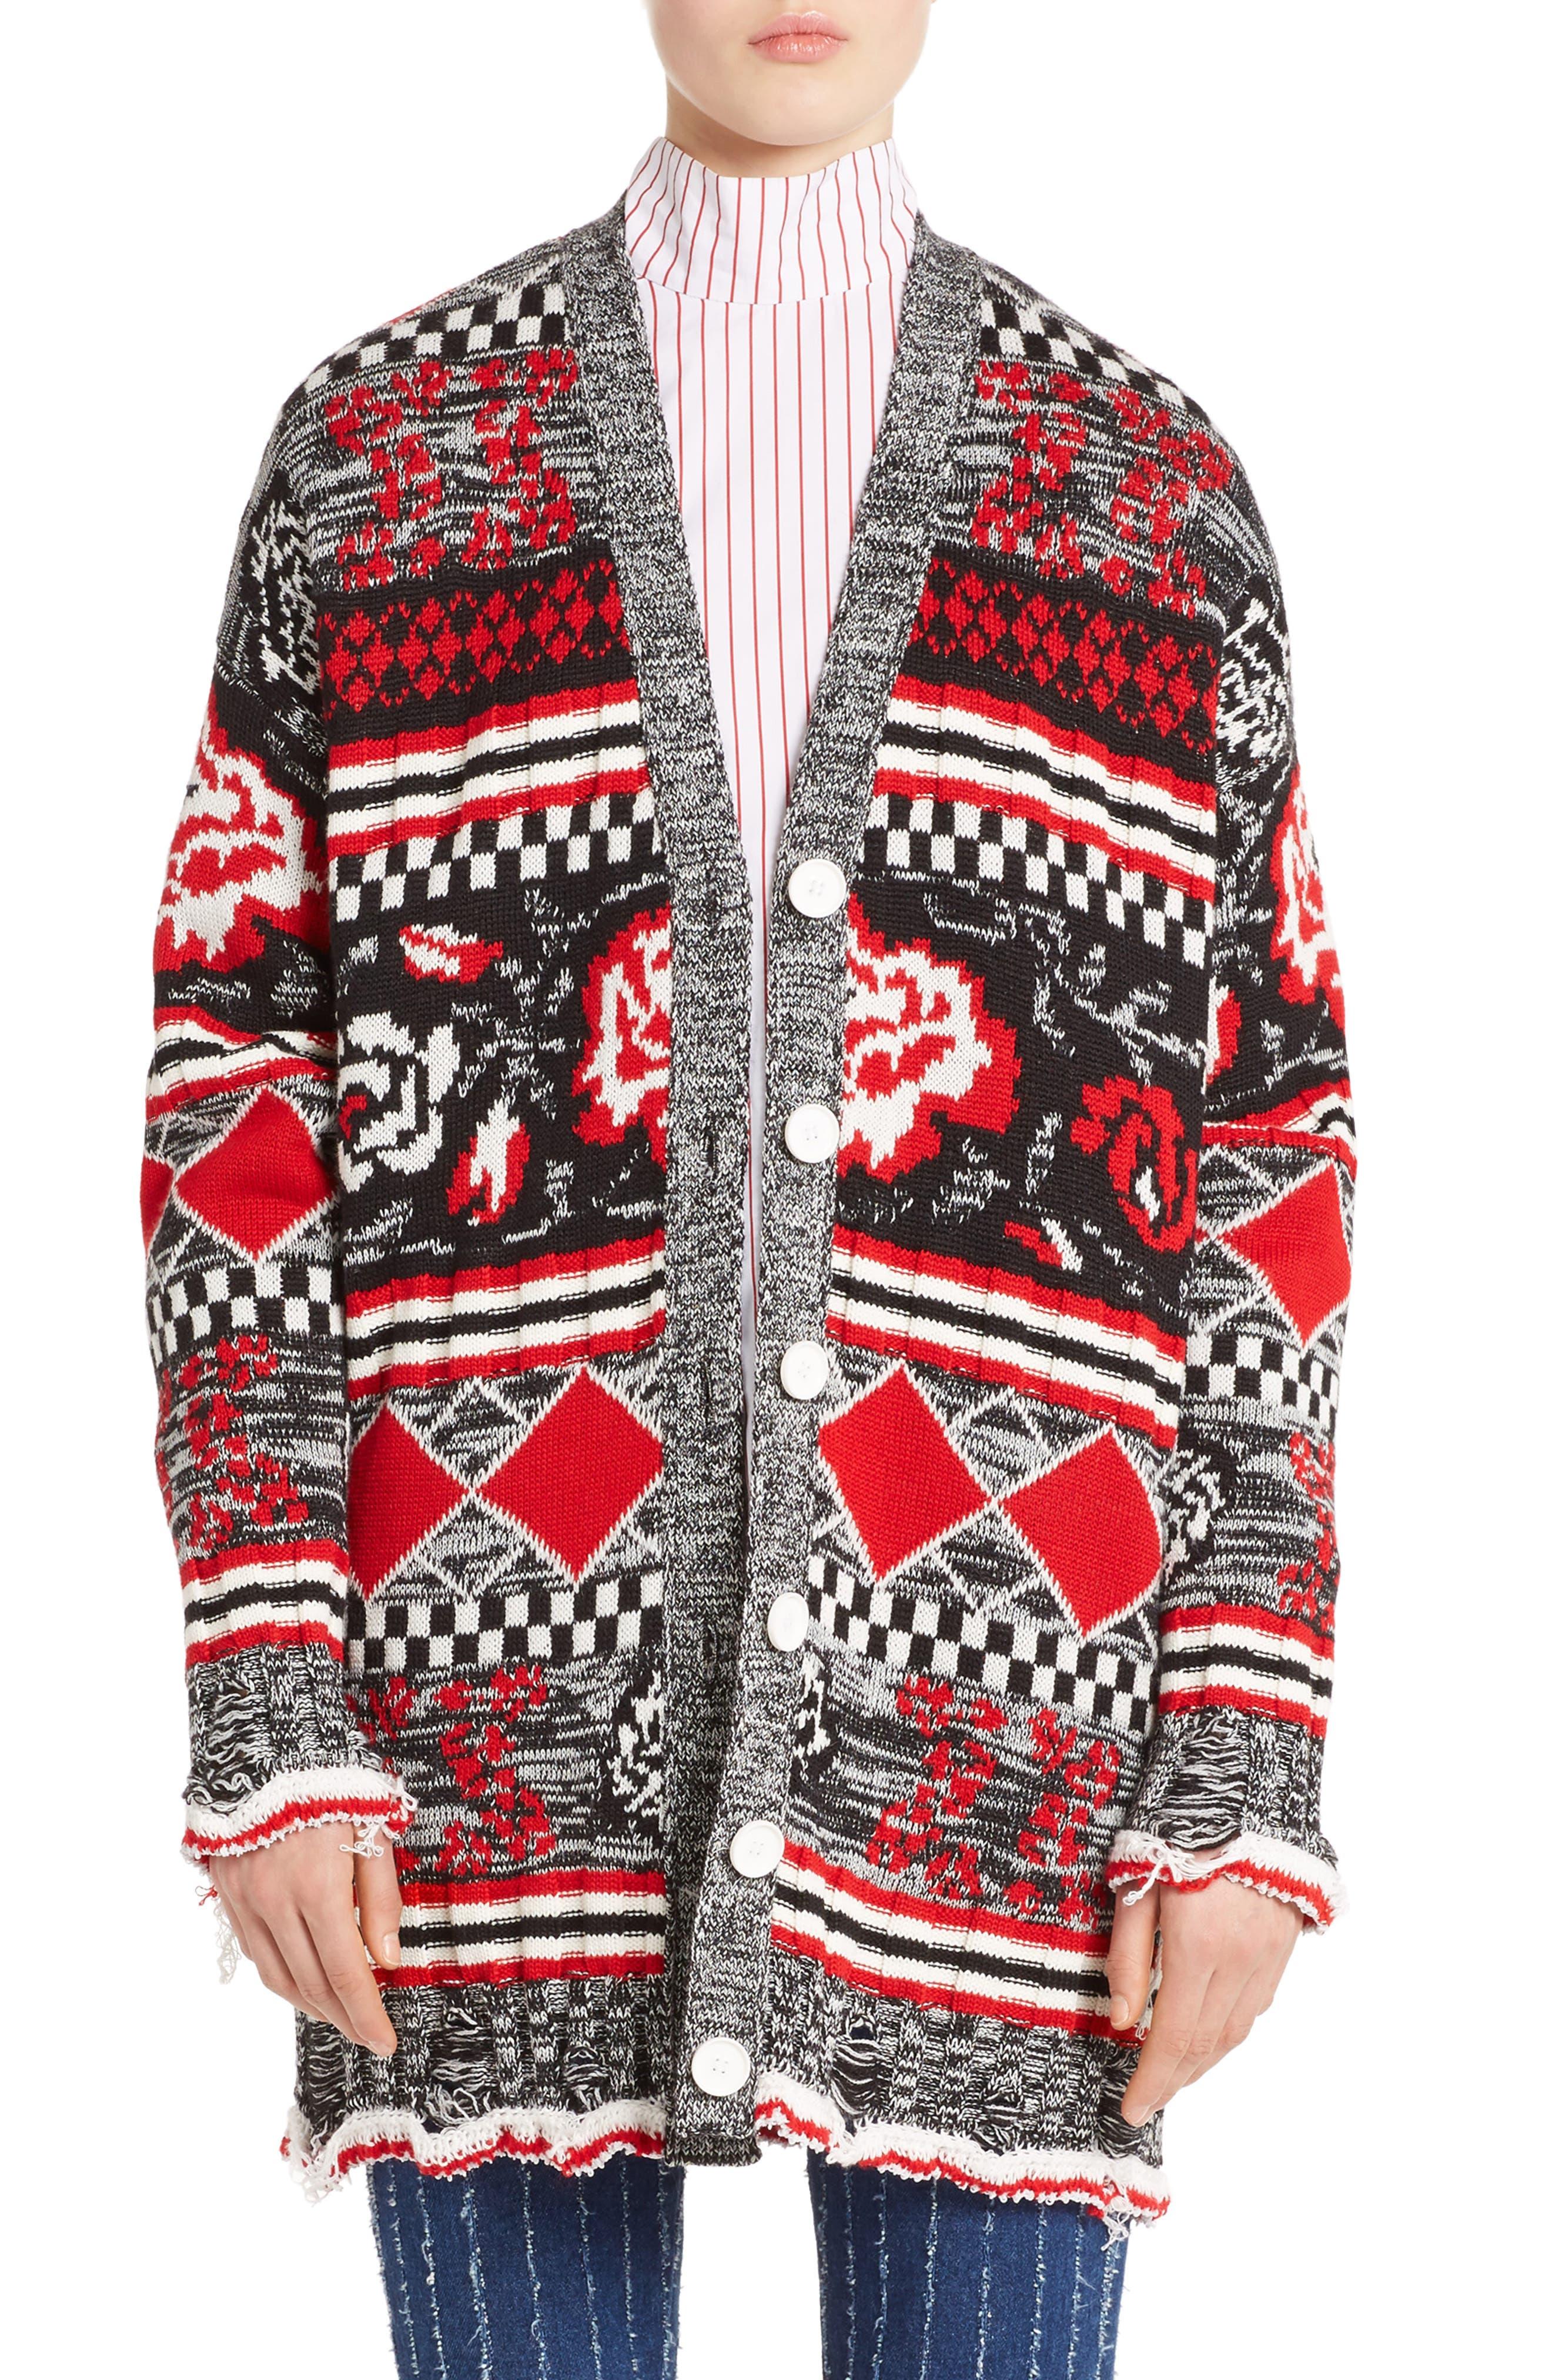 Rose Jacquard Wool Blend Cardigan,                         Main,                         color, Black/ Red/ White